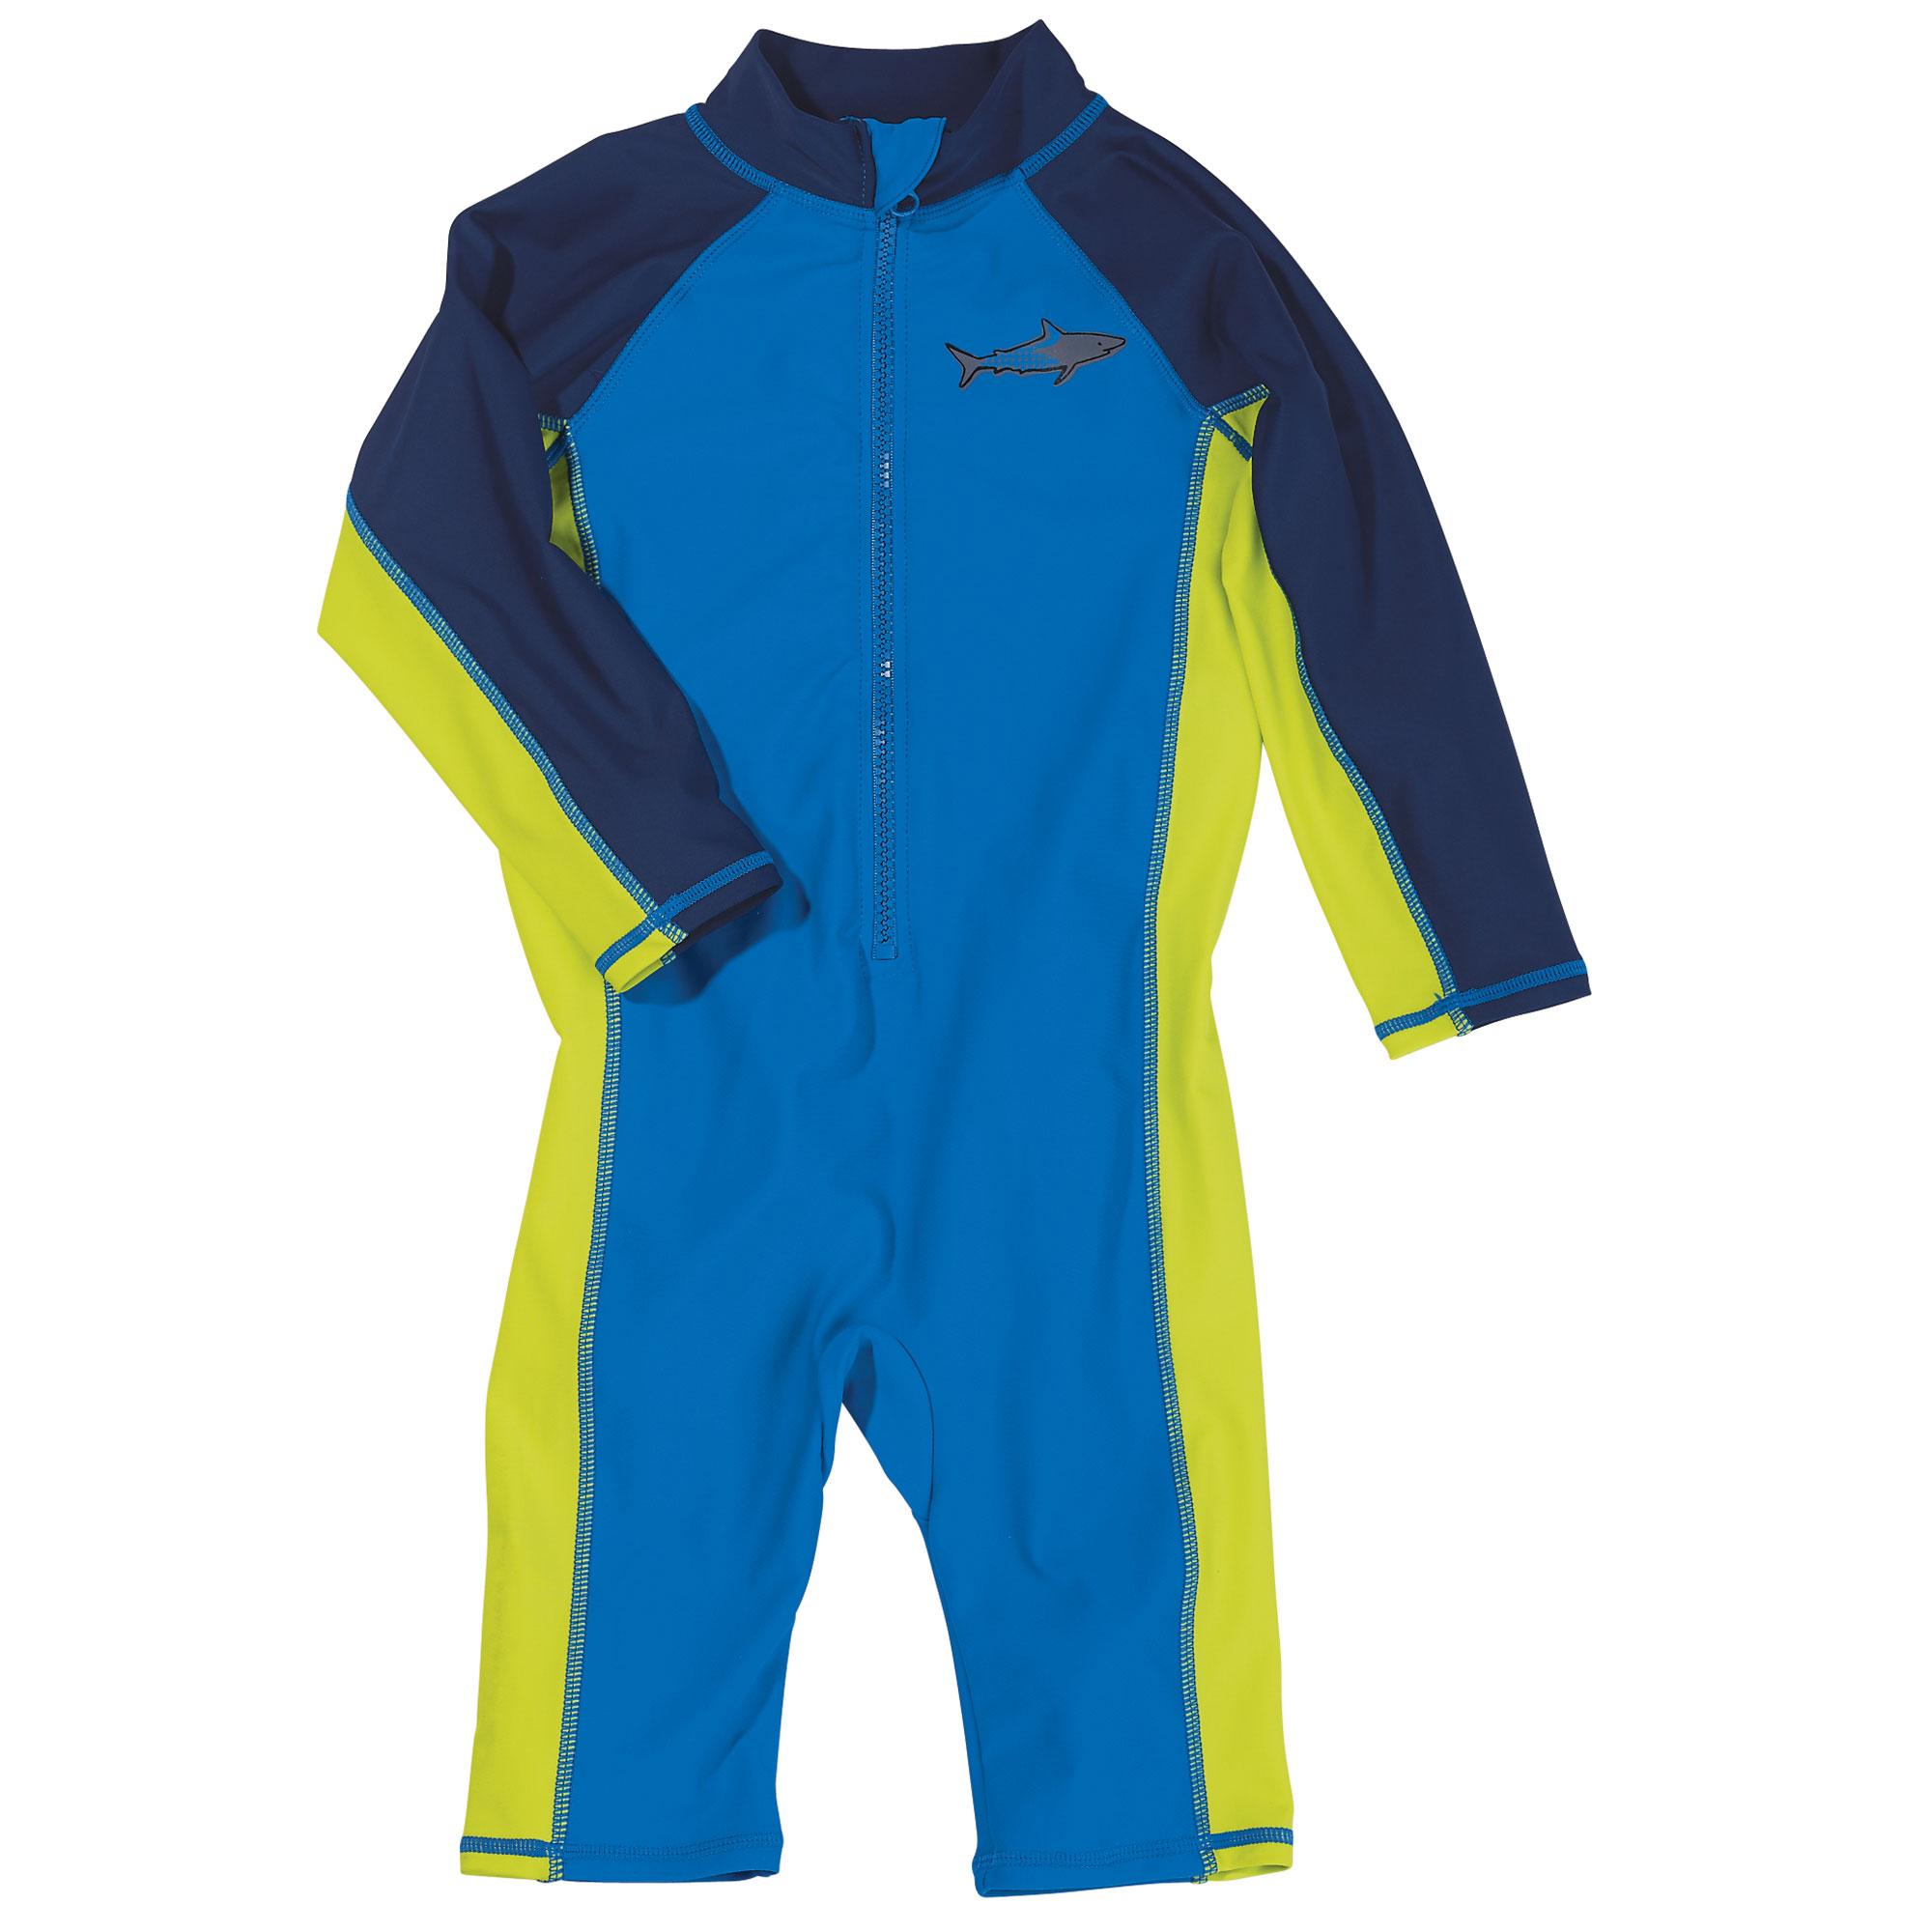 Sun Smarties Little Boy Surf Suit - Blue and Navy Shark - Maximum Sun Protection Swimsuit